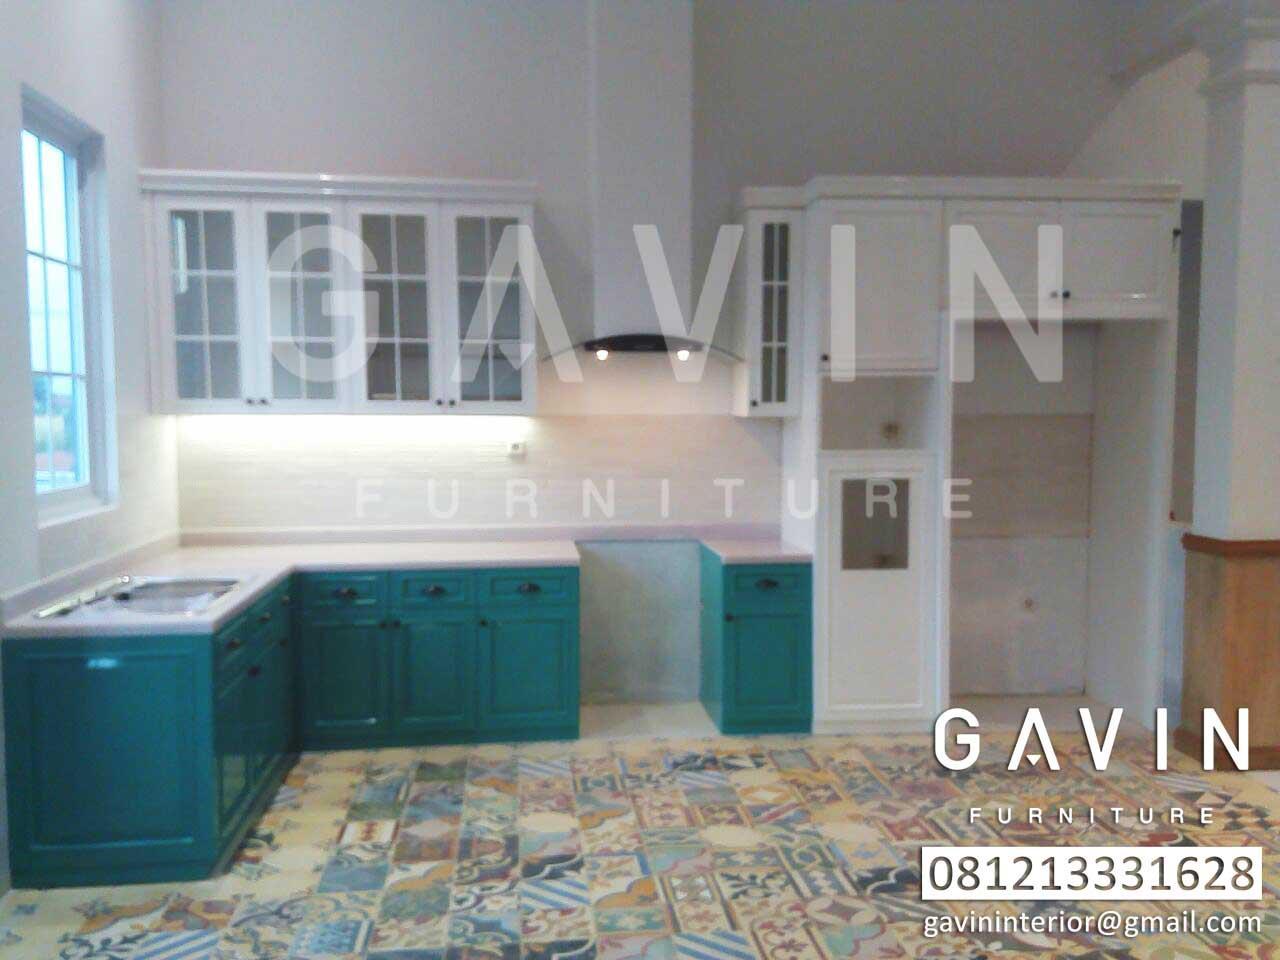 design kitchen set semi klasik by gavin